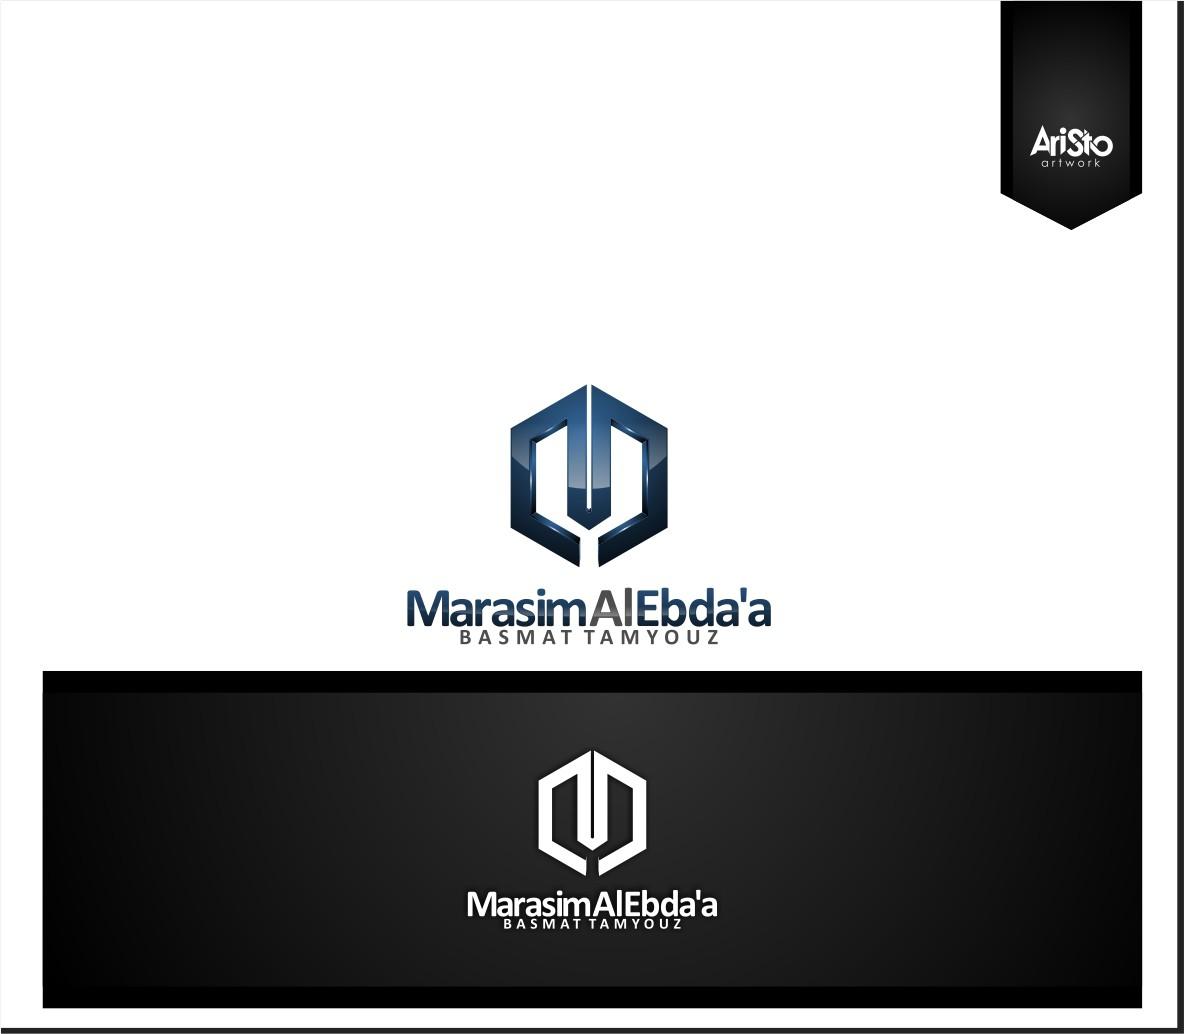 logo for Marasim Al Ebda'a